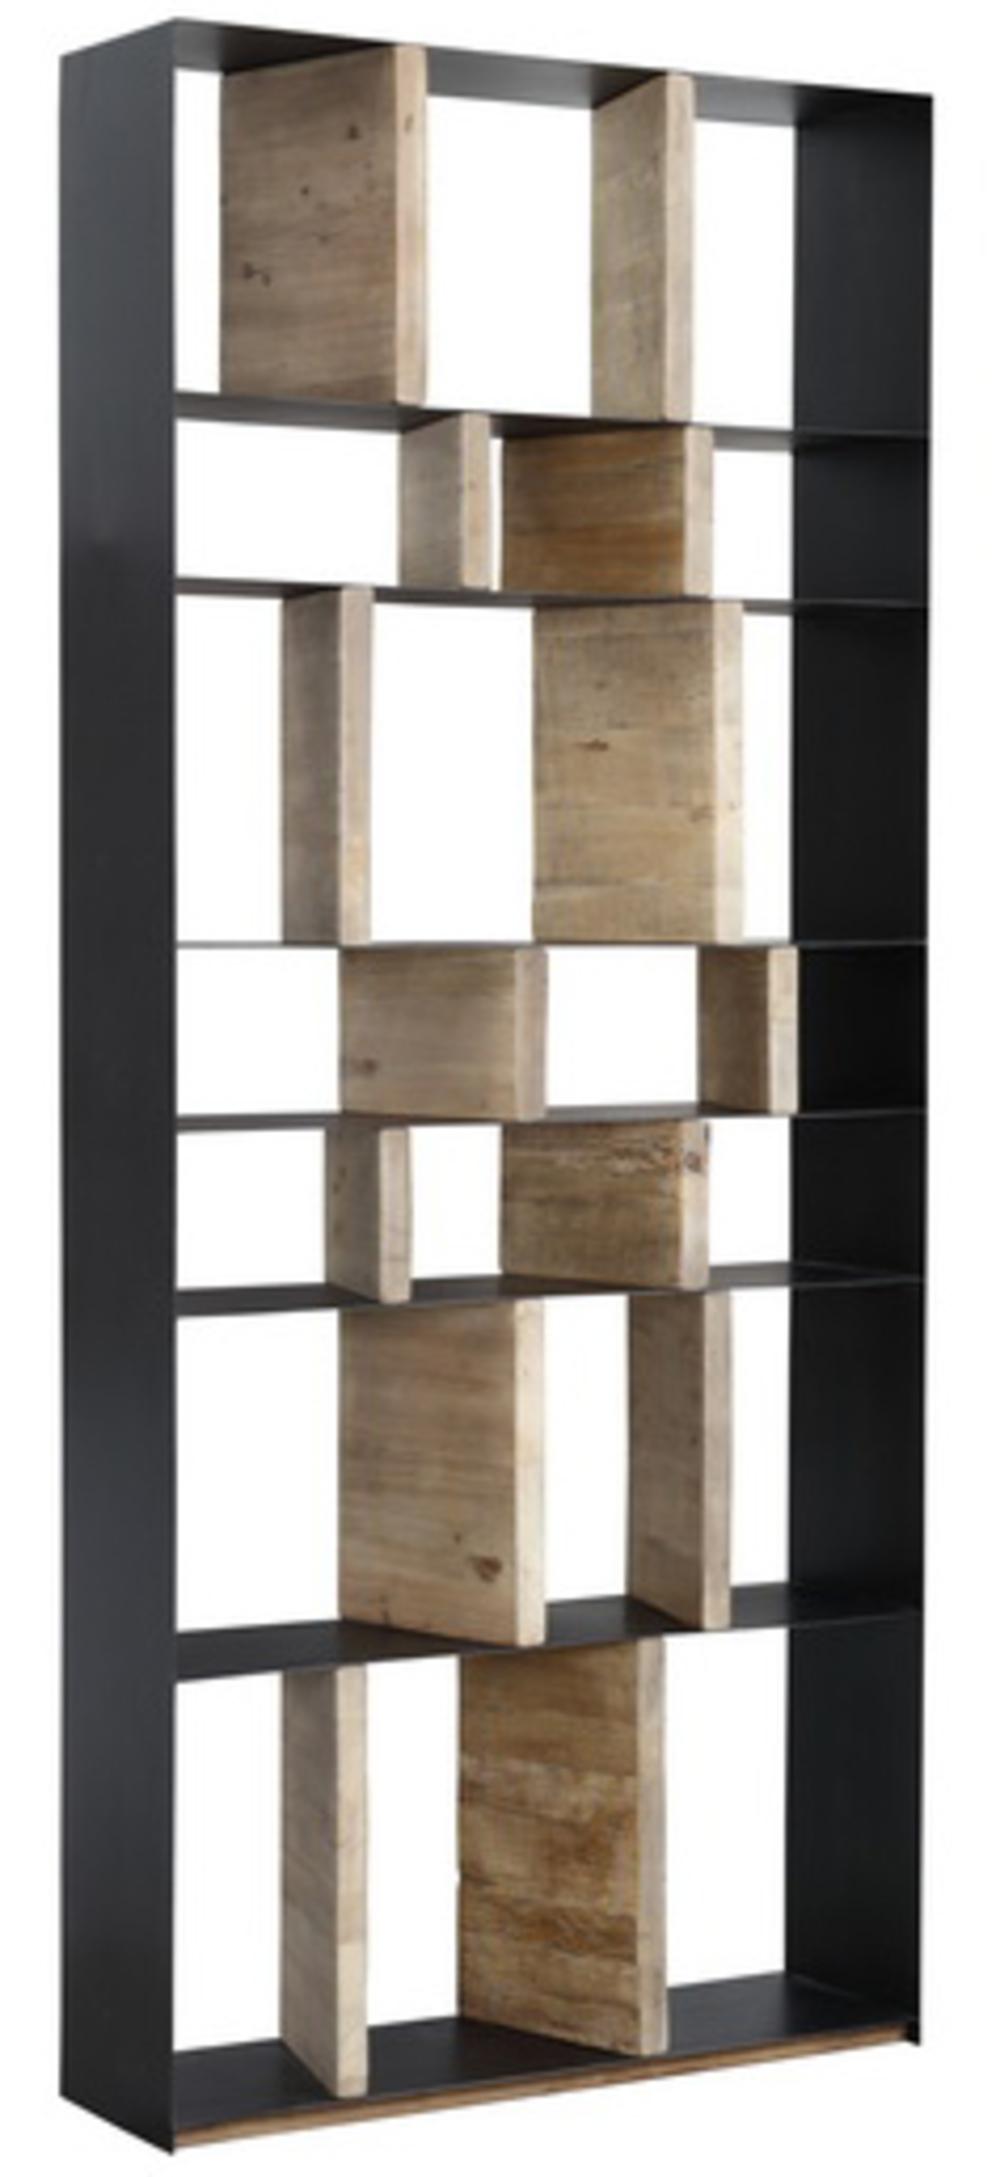 Dovetail Furniture - Mahoney Bookcase